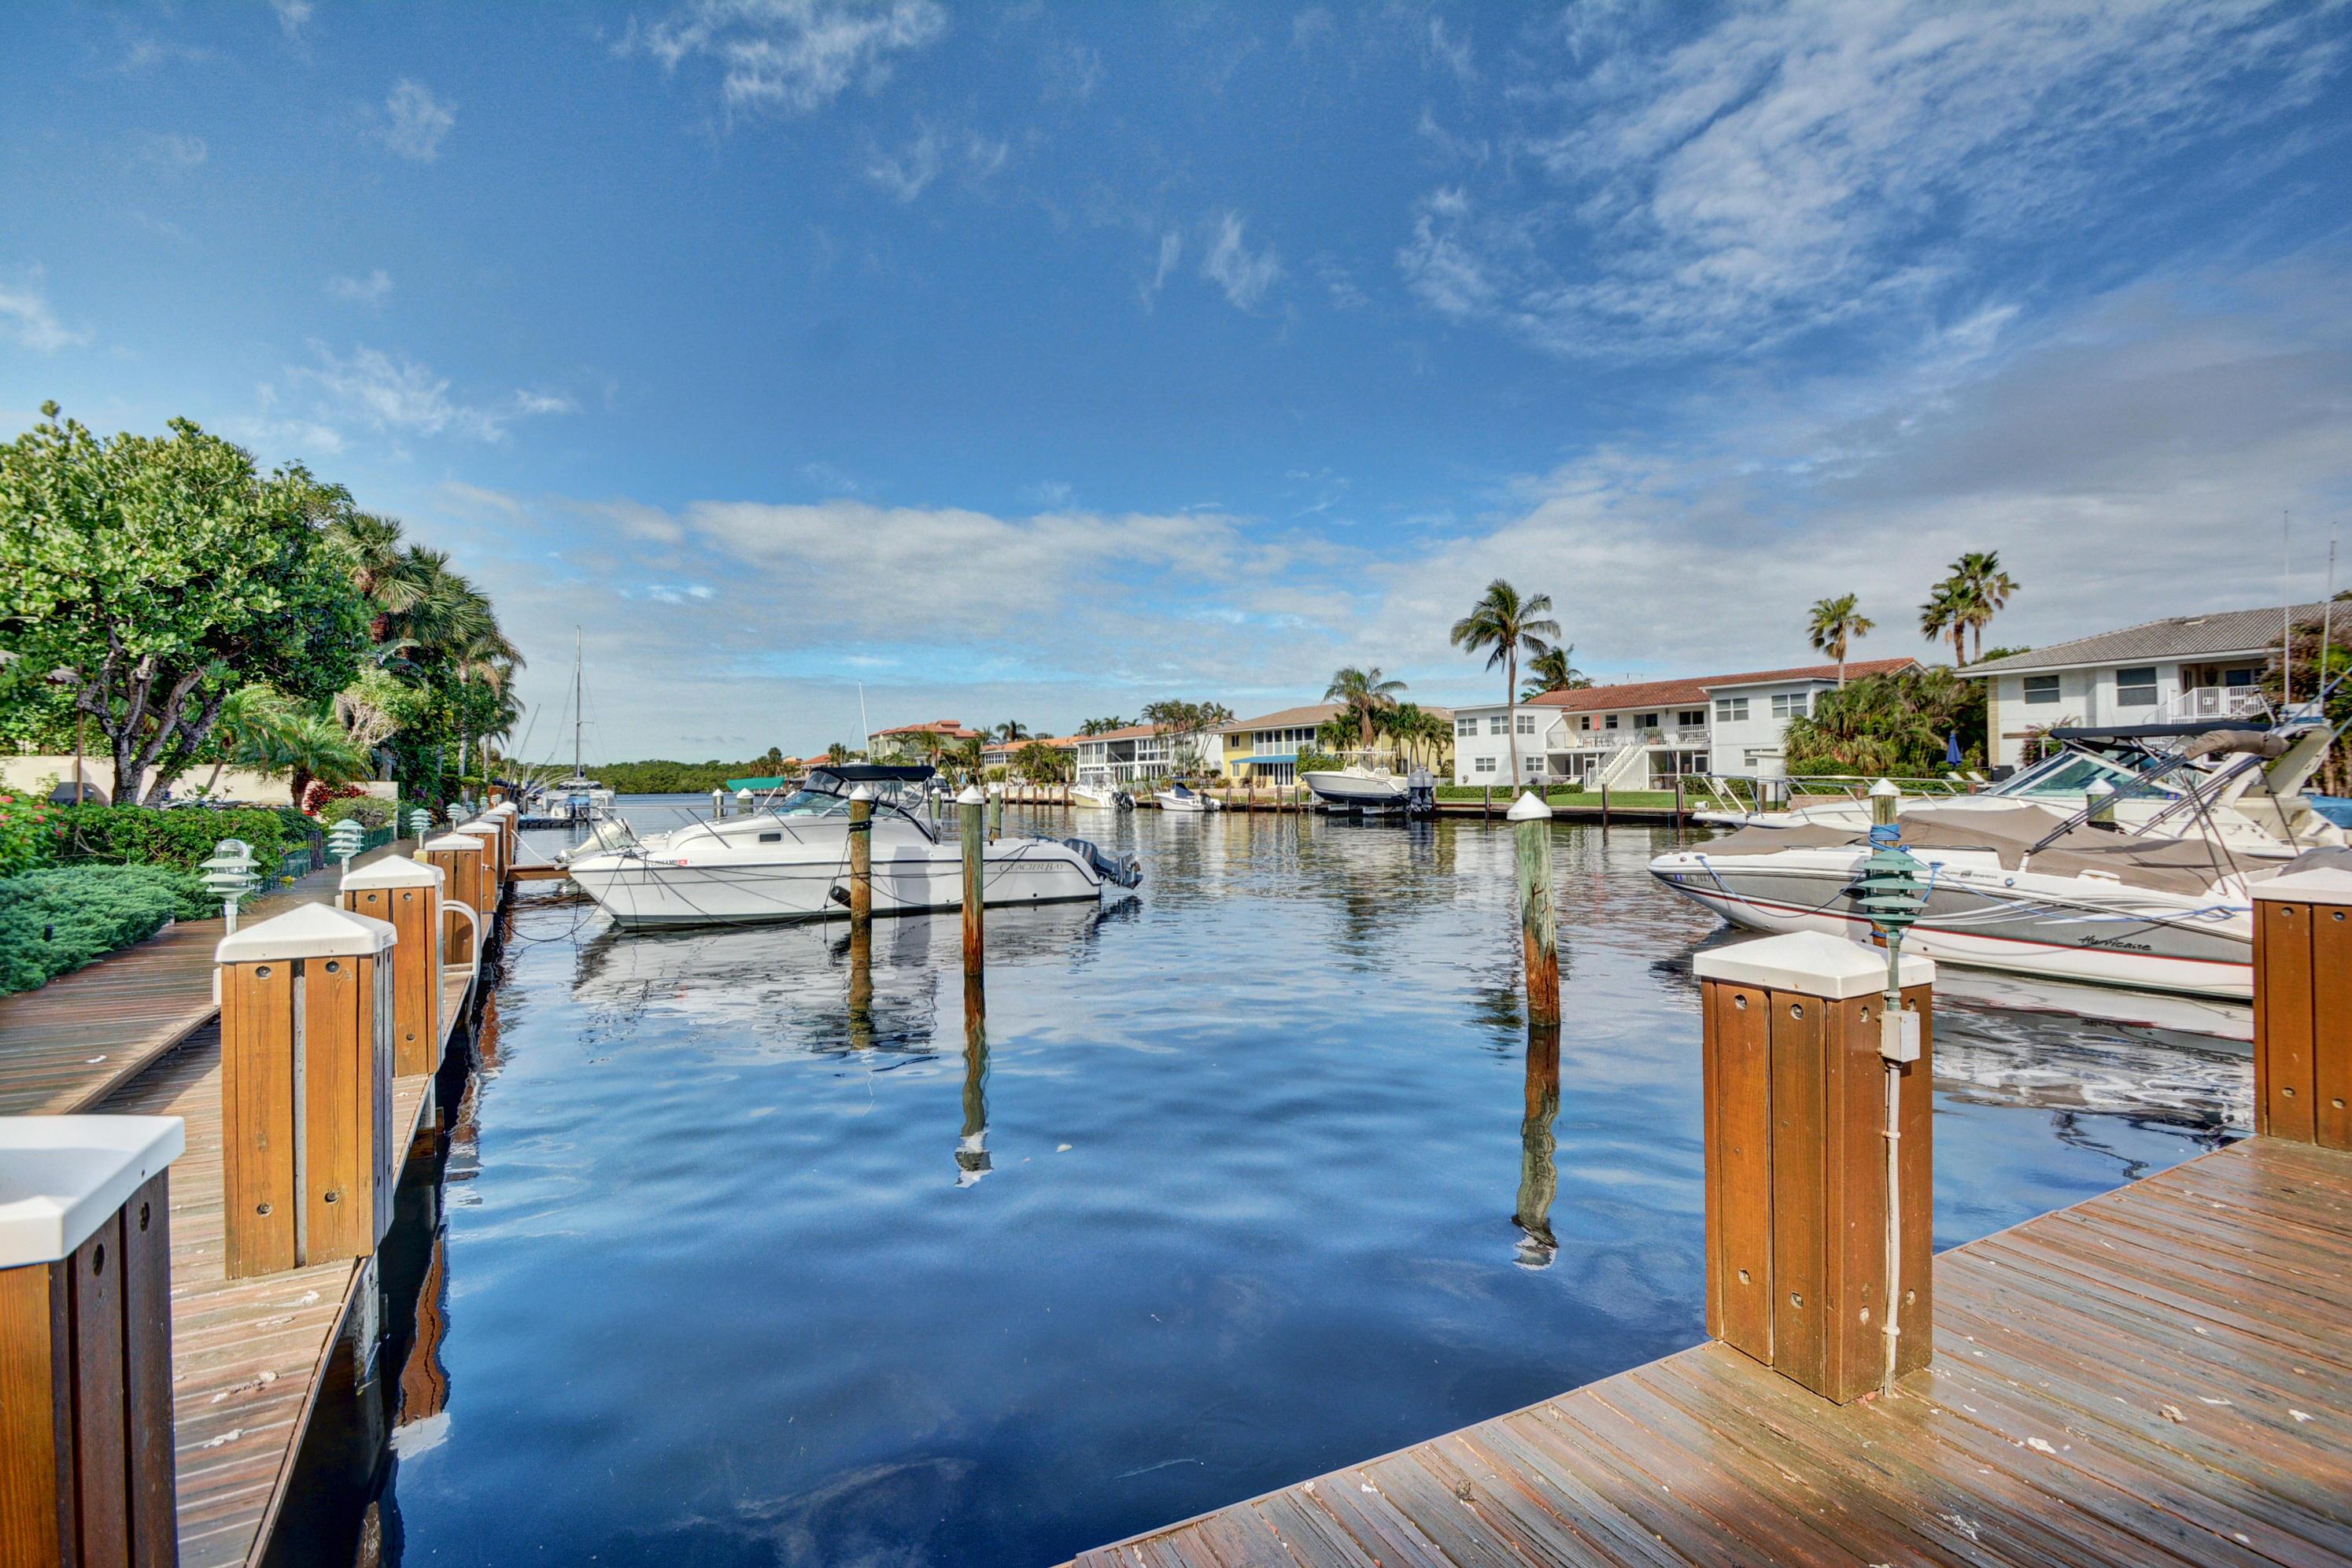 CAMINO COVE HIGHLAND BEACH FLORIDA